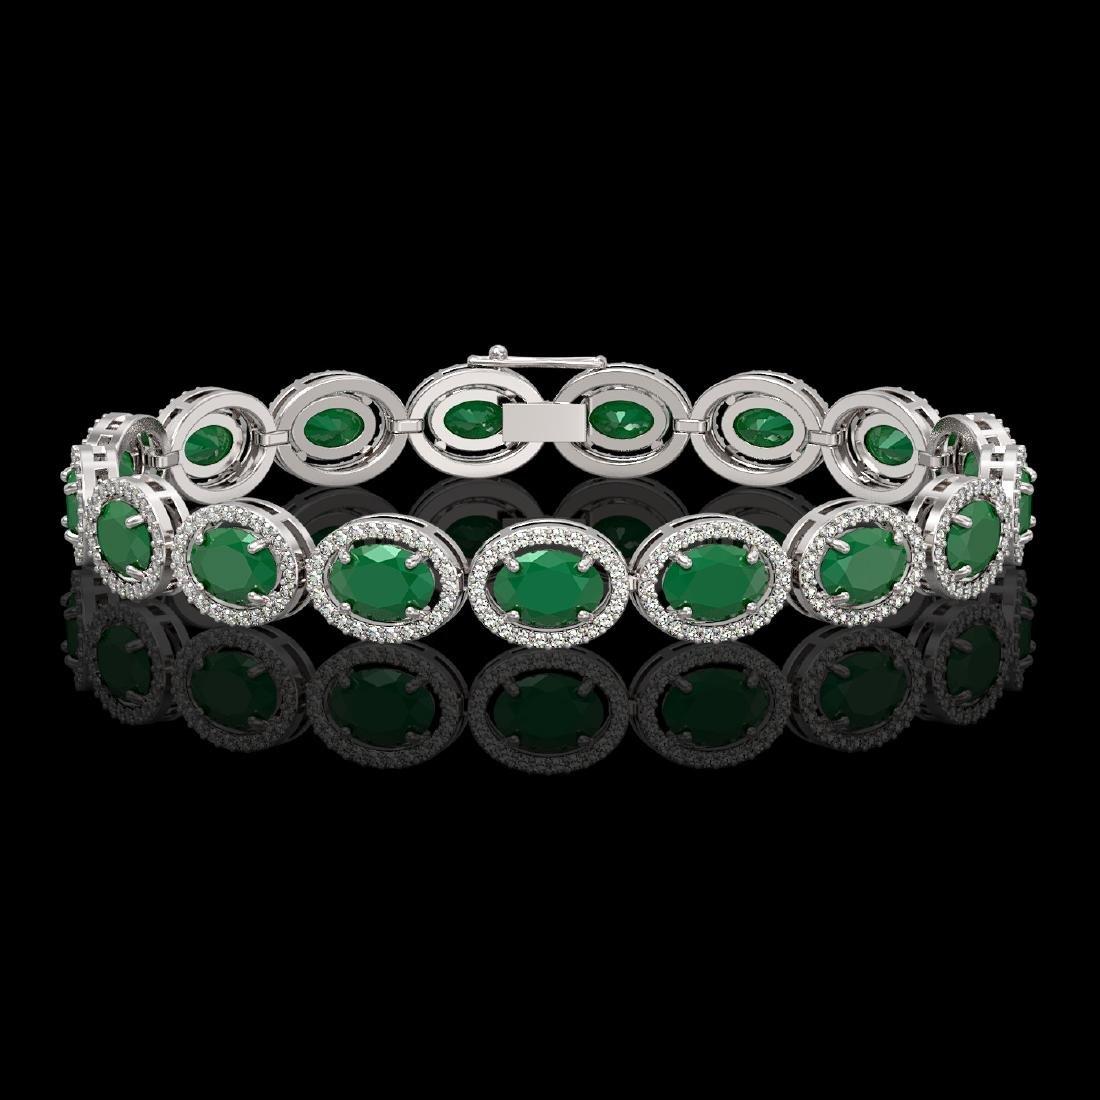 22.89 CTW Emerald & Diamond Halo Bracelet 10K White